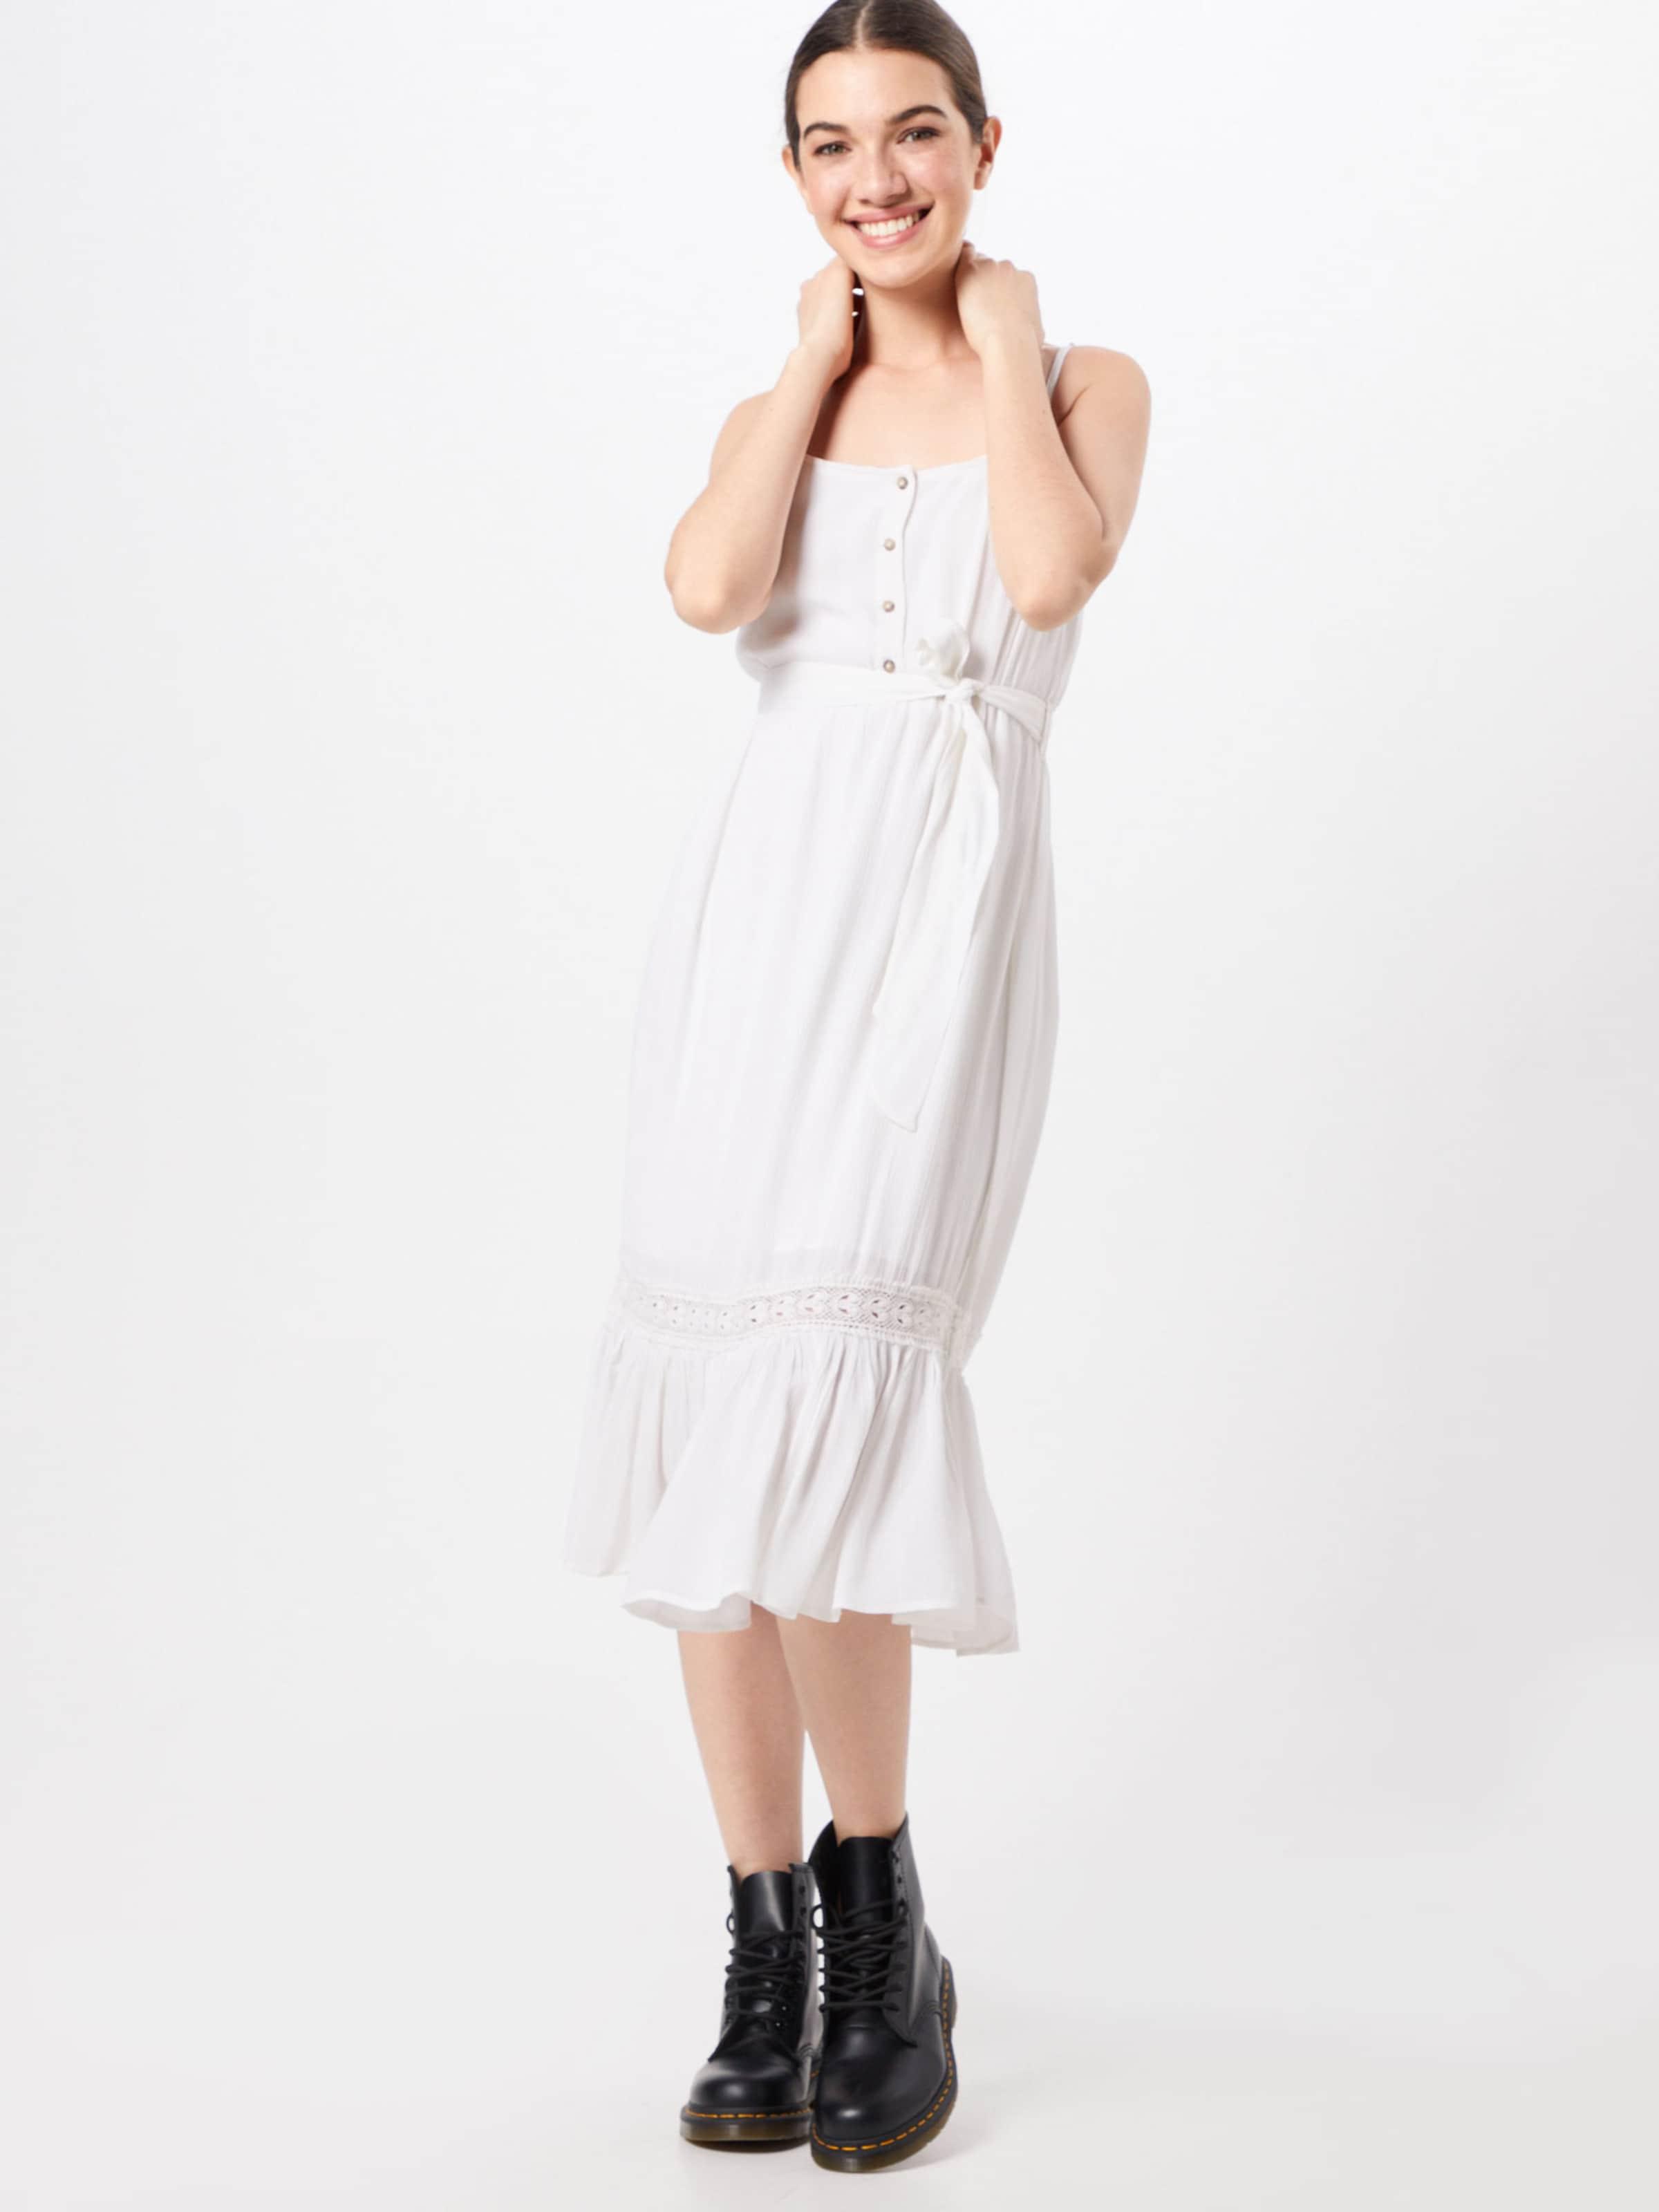 Midi 'donnaromaina kd Blanc X D'été Dress' Na Robe En cA35LqR4jS